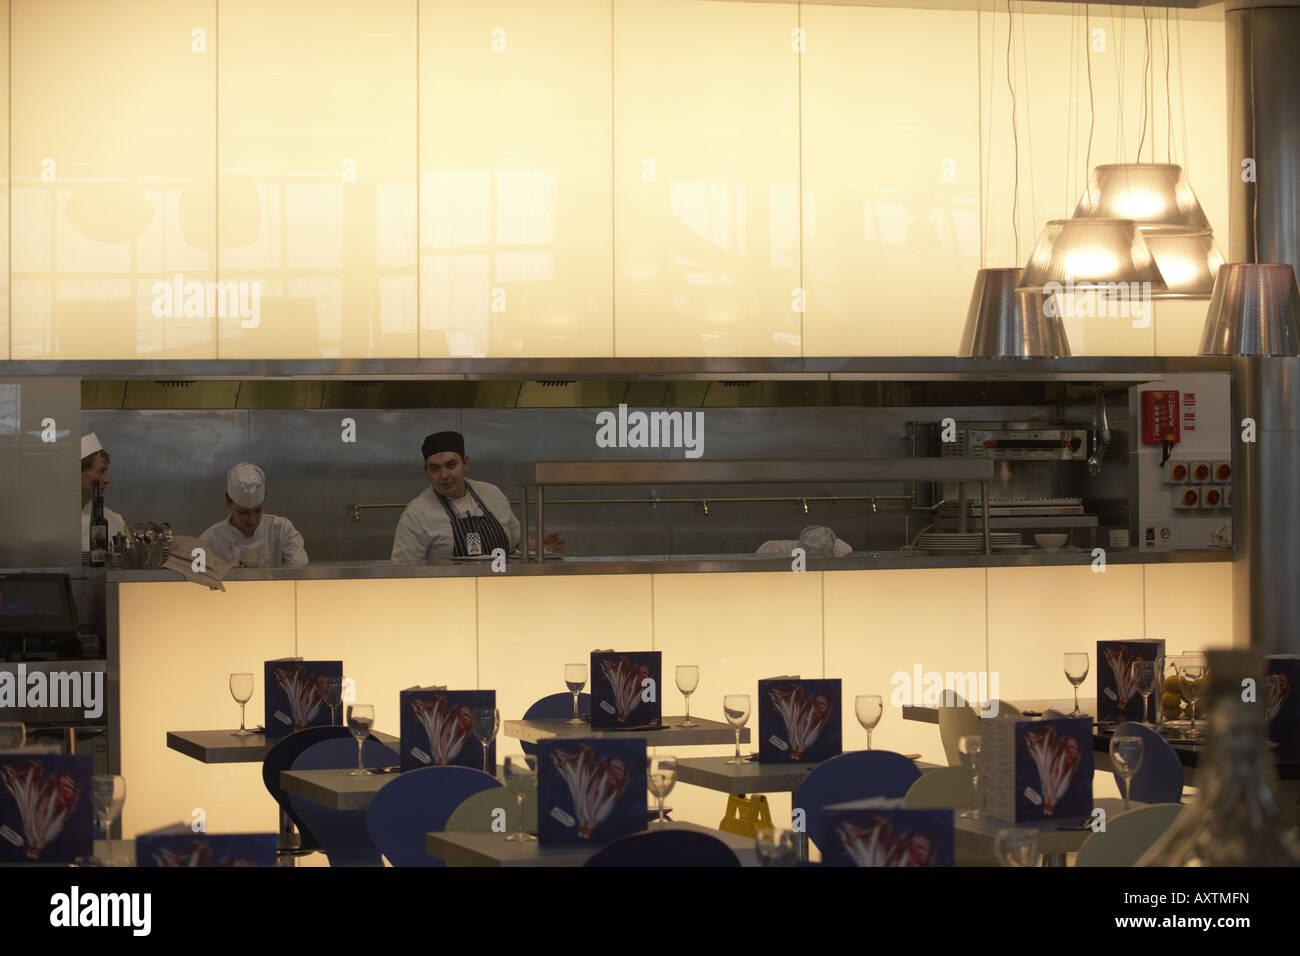 Chefs inside Carluccio's retail restaurant in landside Departures area of London Heathrow Airport's Terminal - Stock Image